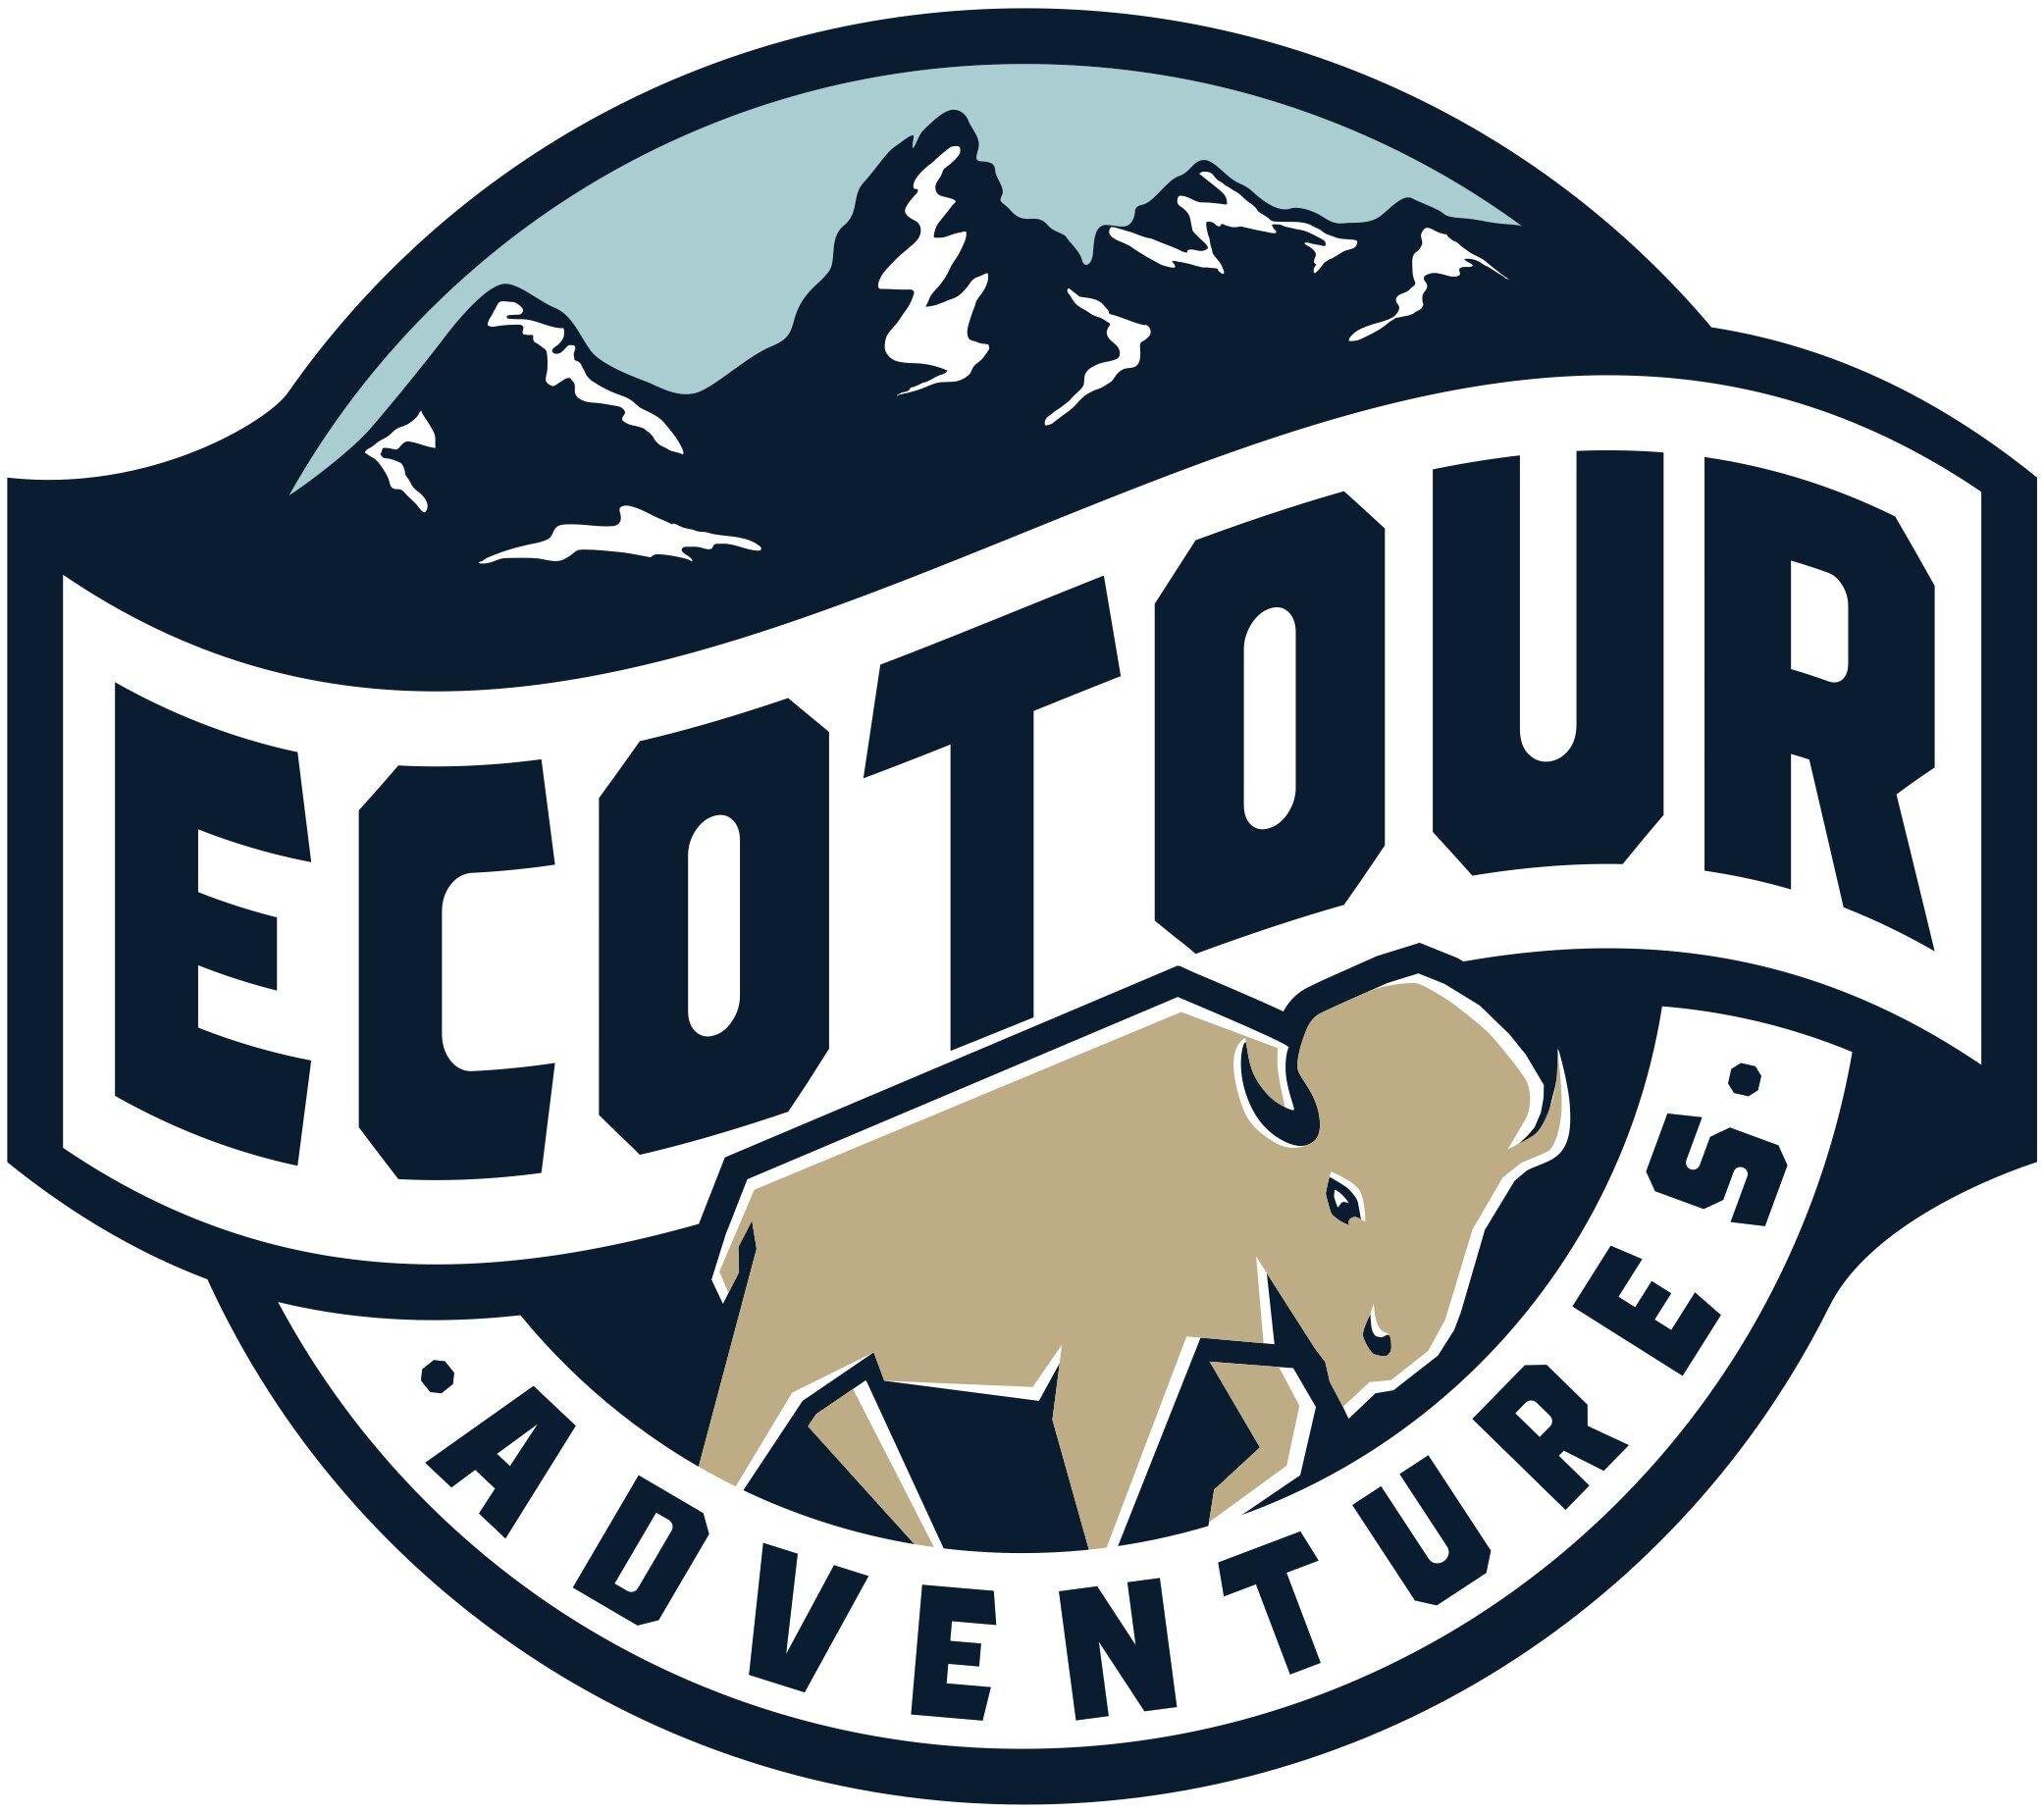 Eco Tours.jpg